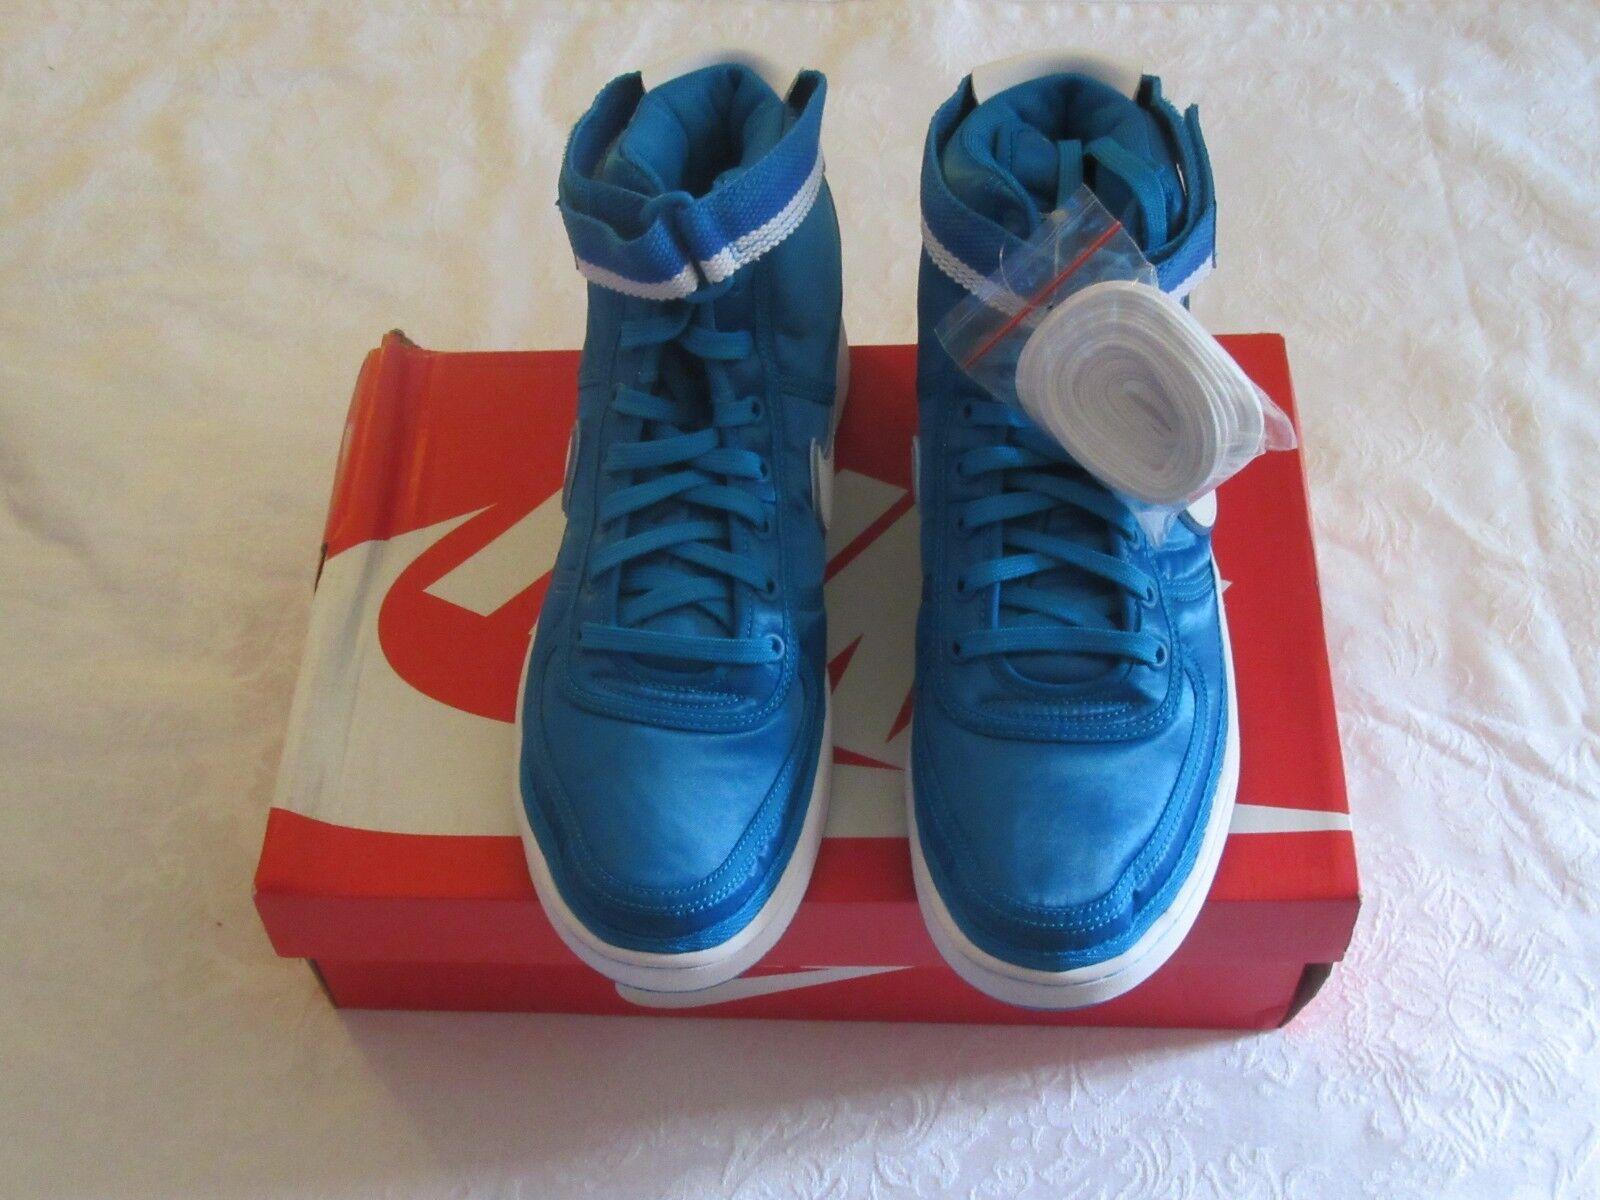 Nike Vandal High Orbit Supreme QS Satin Azul Orbit High Blanco 318330 400 comodas 5f7ba0